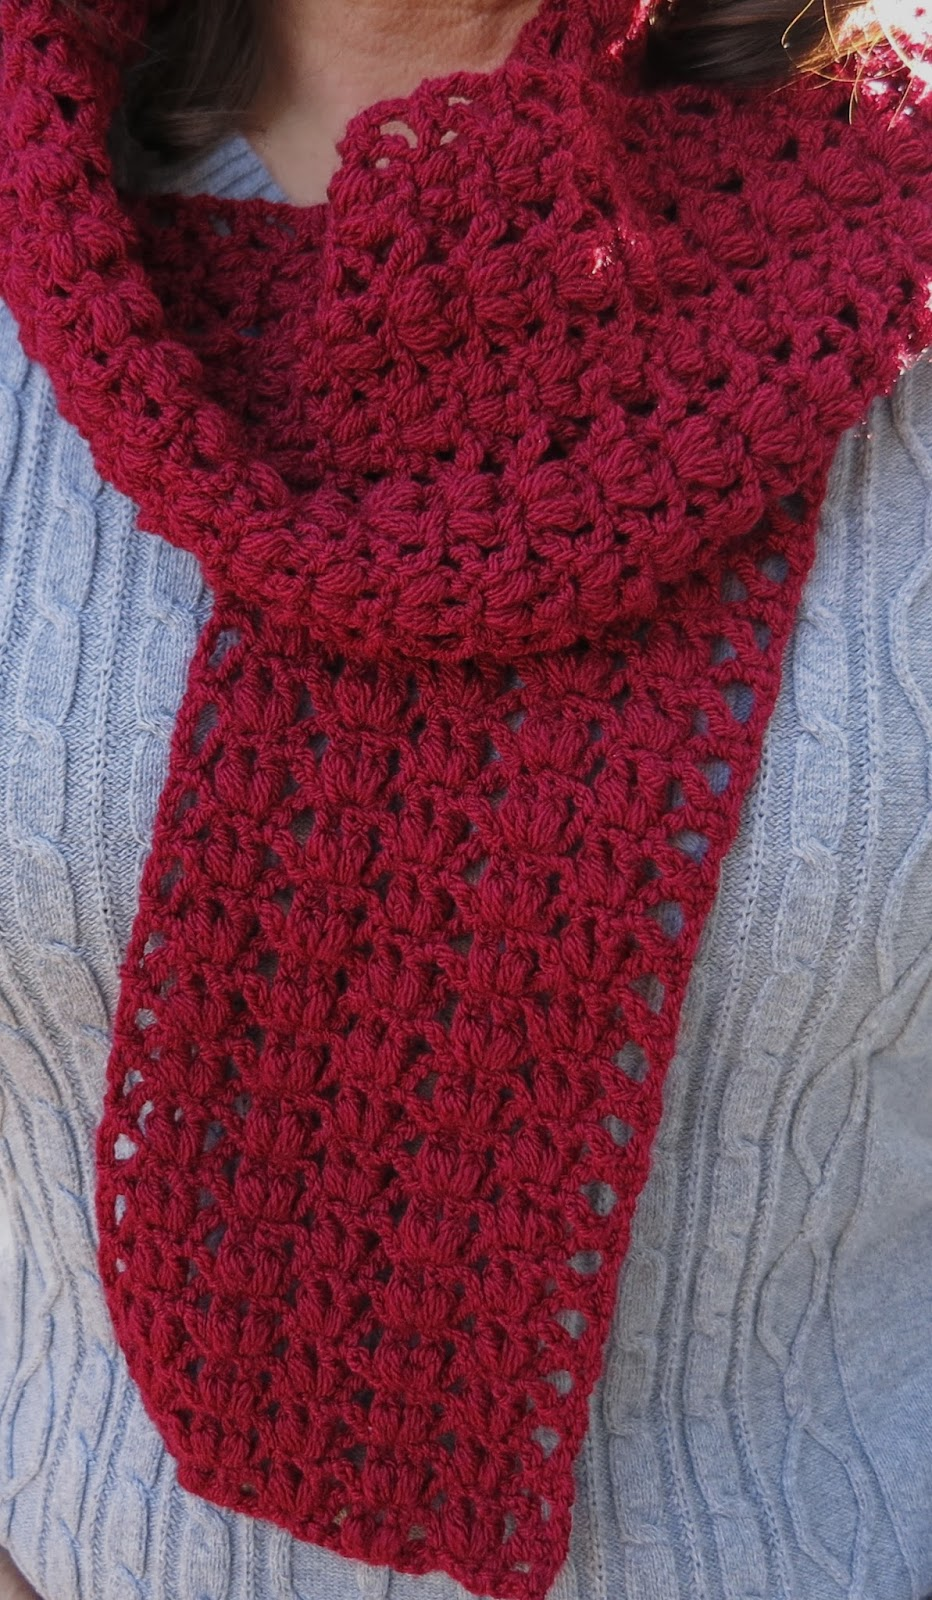 Da\'s Crochet Connection: Zig Zag Heart Scarf